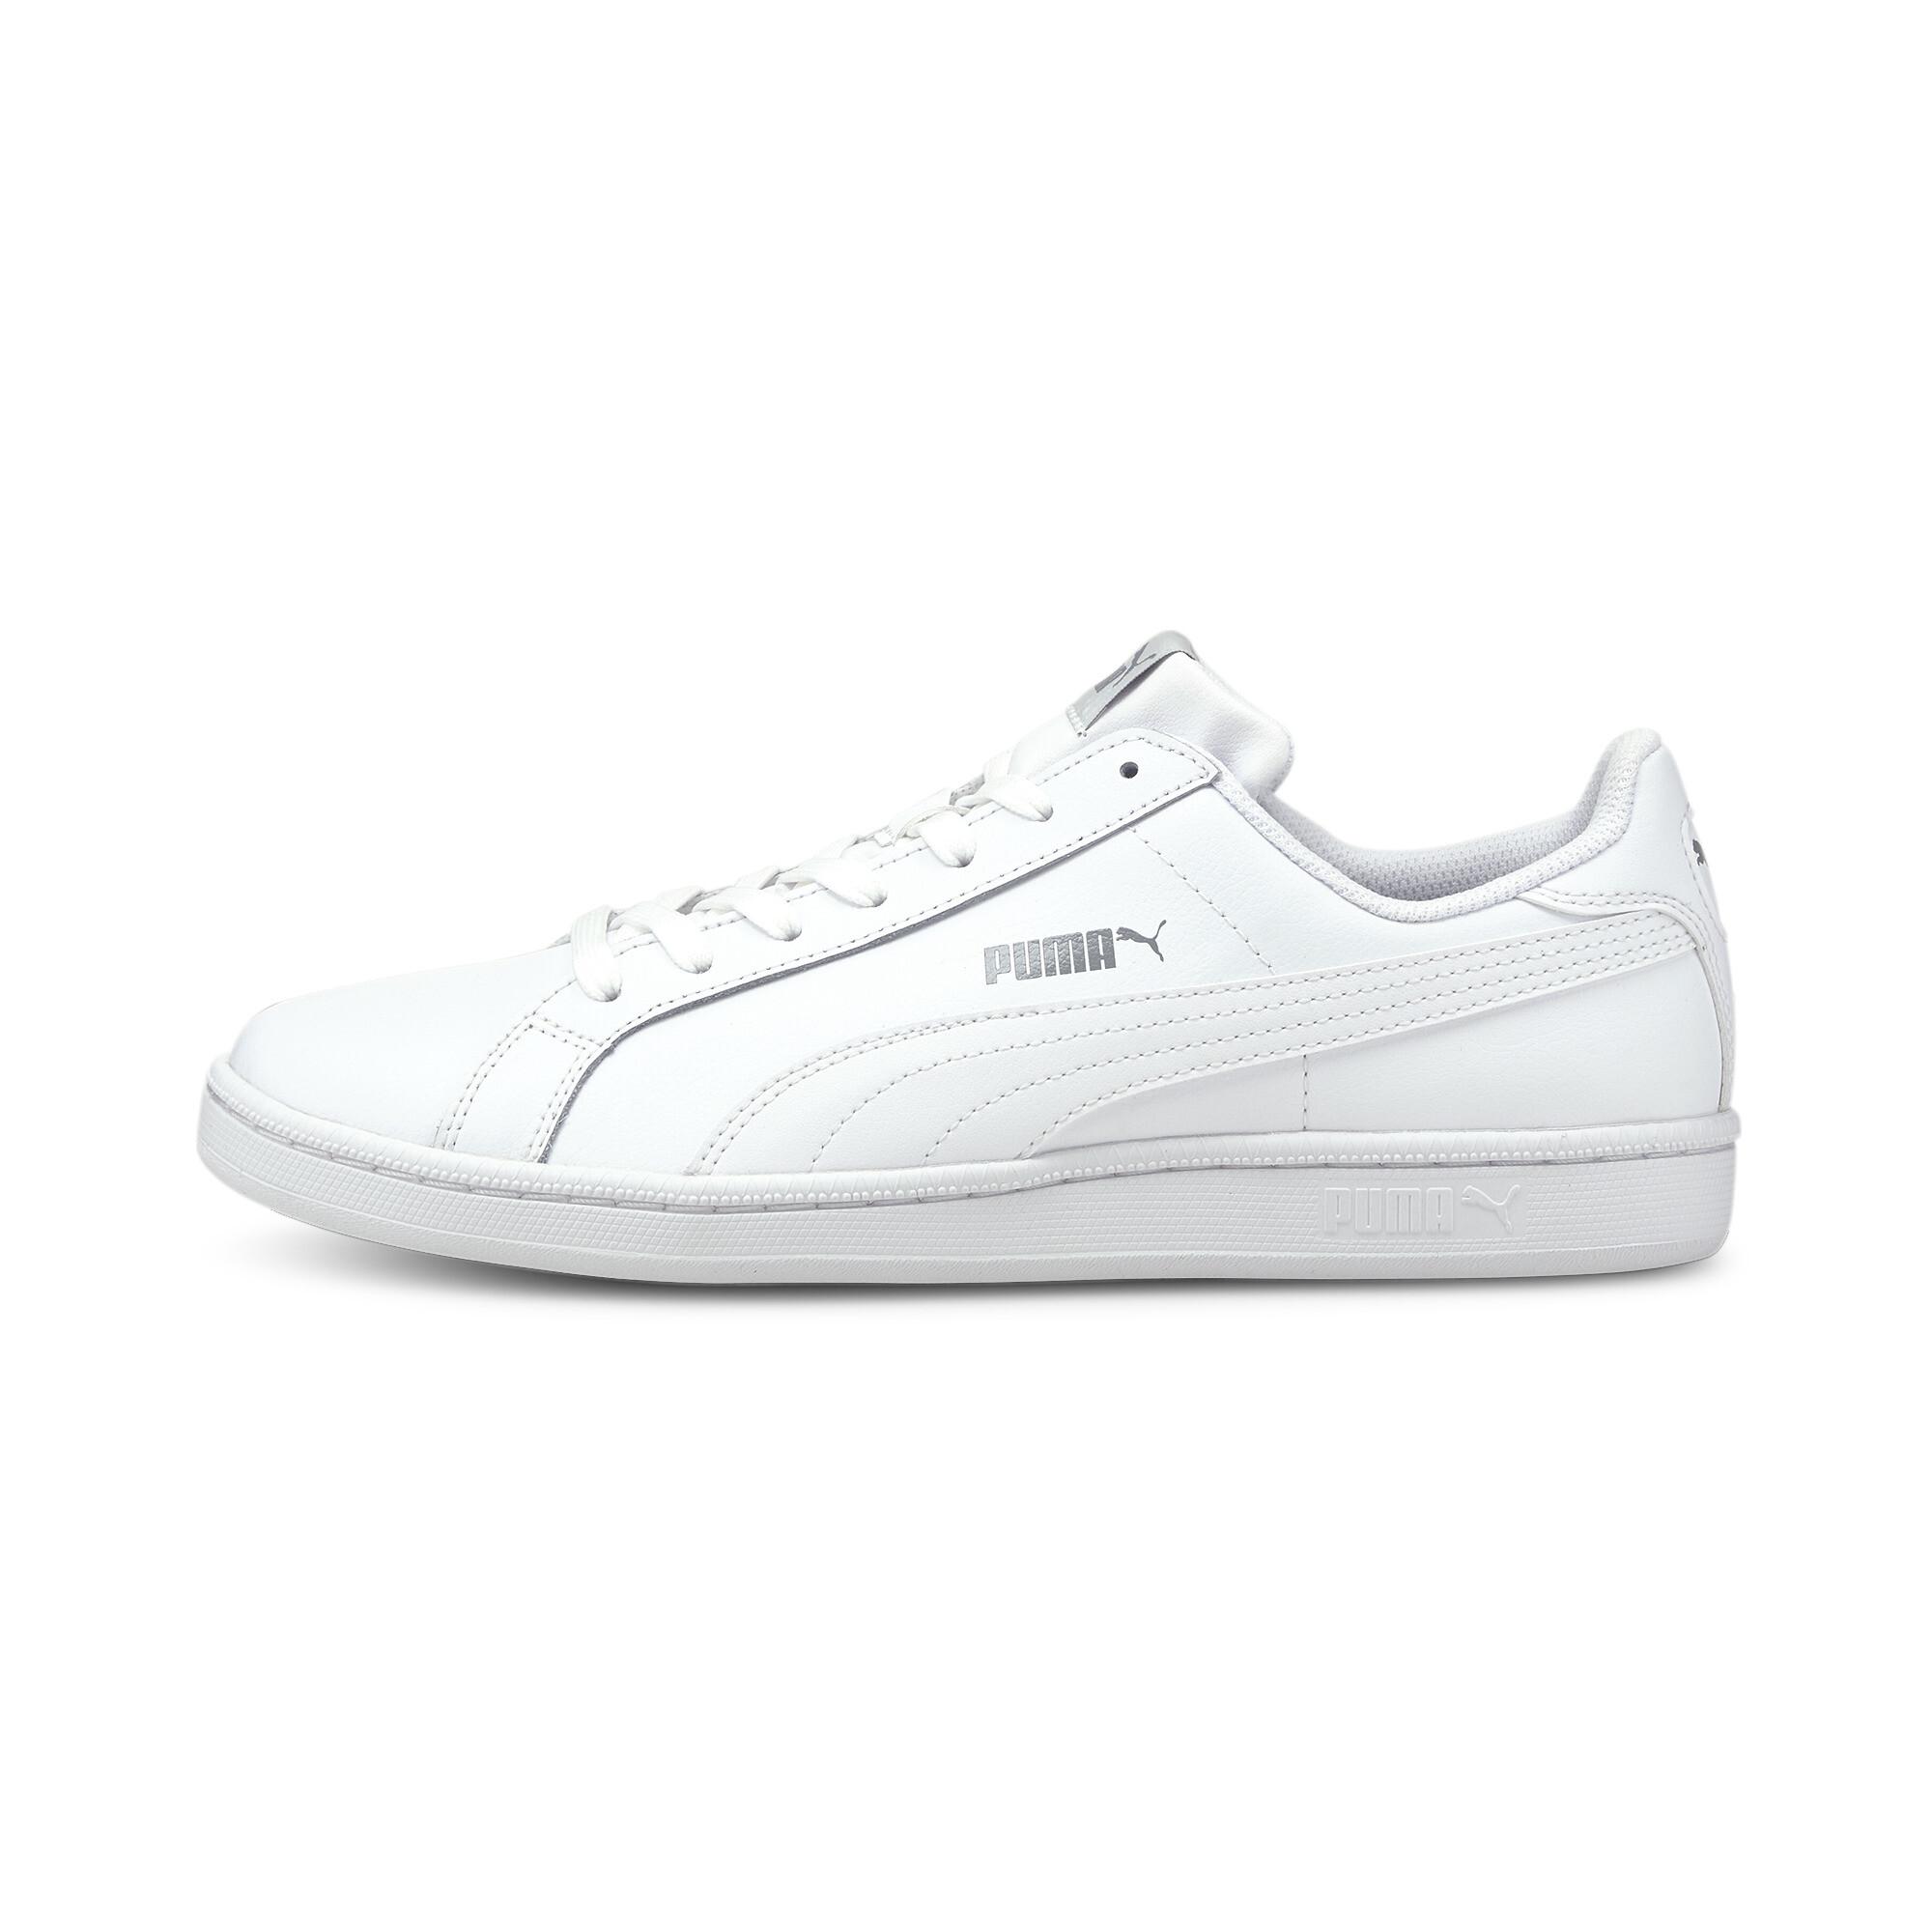 PUMA-Smash-Trainers-Schuhe-Sneakers-Sport-Classics-Unisex-Neu Indexbild 14